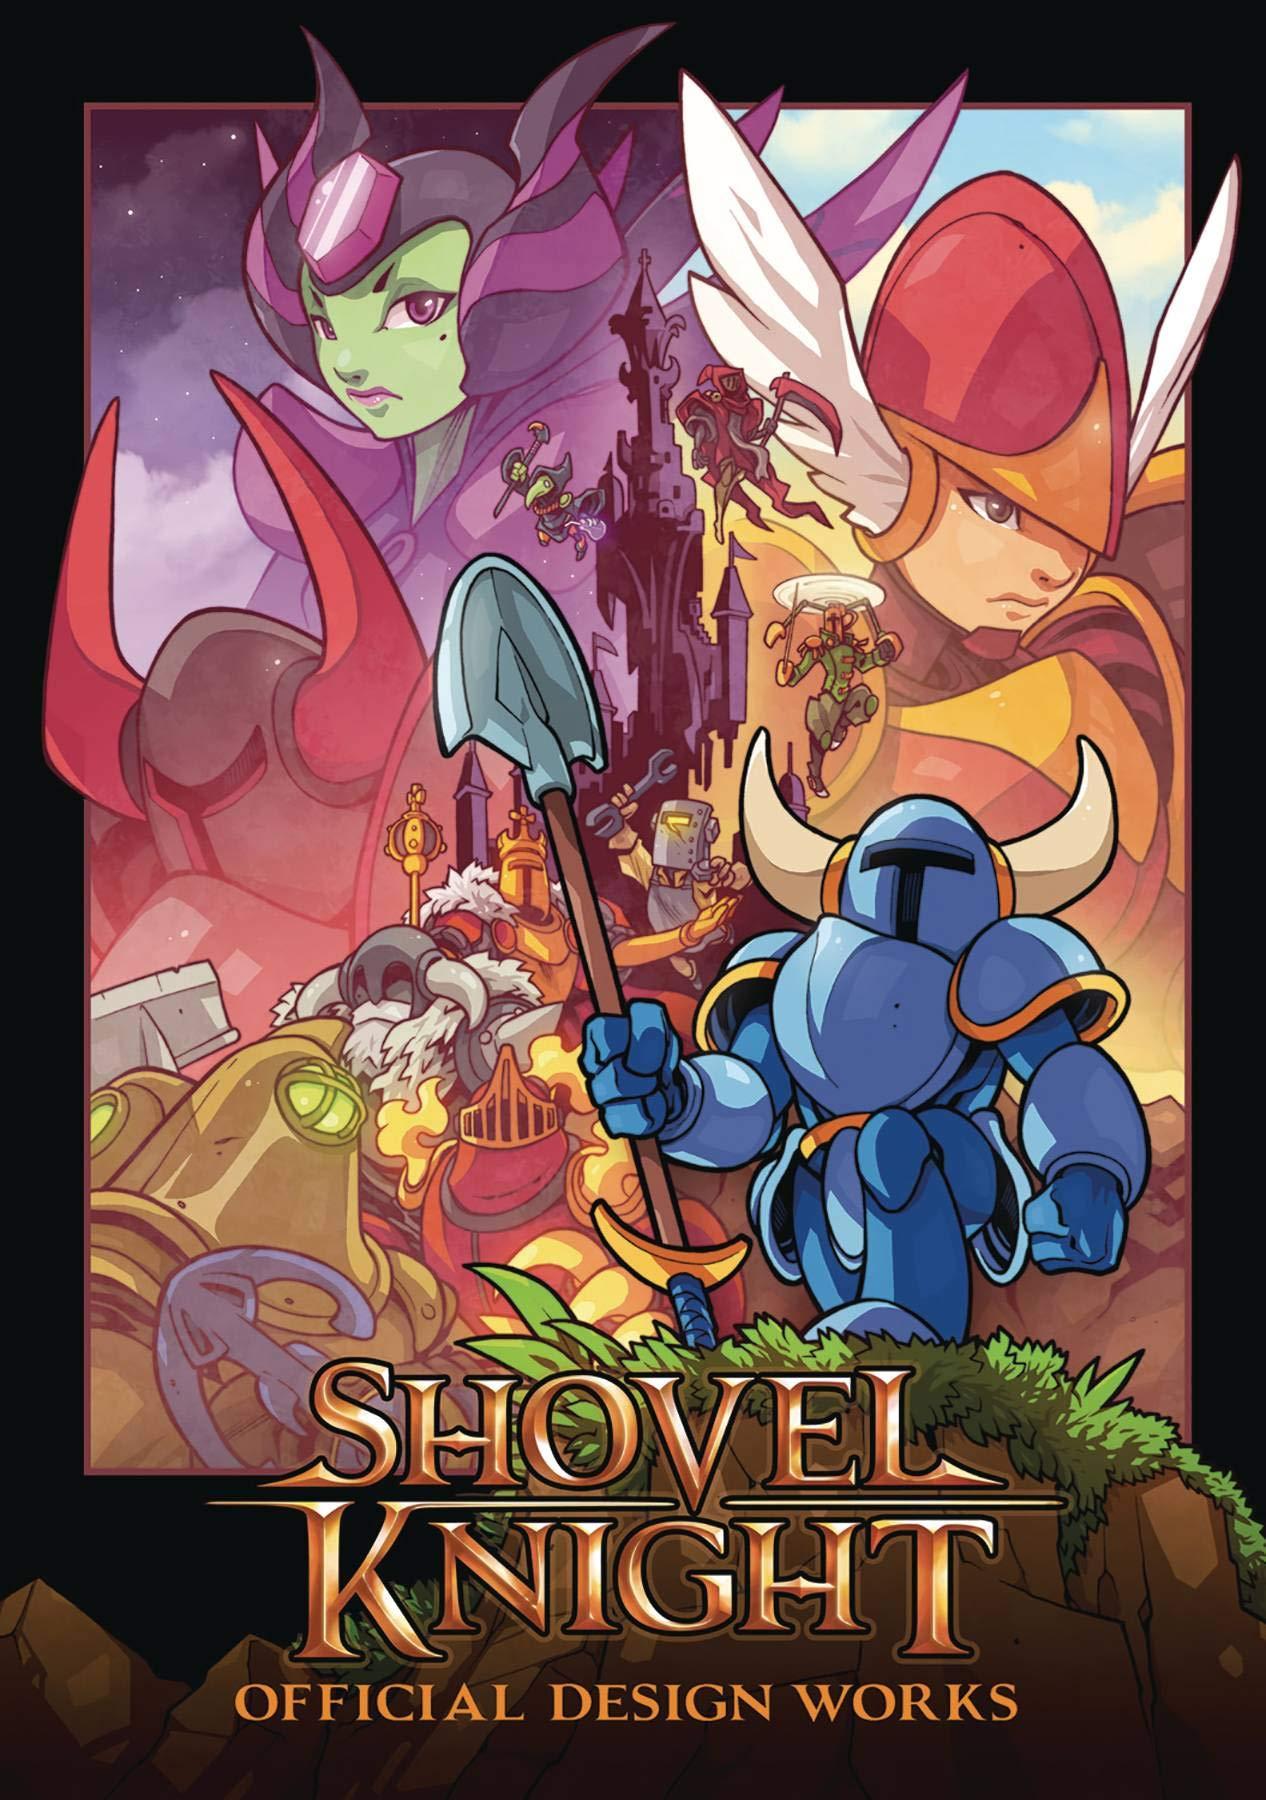 Shovel Knight: Official Design Works: Amazon.es: Yacht Club Games: Libros en idiomas extranjeros